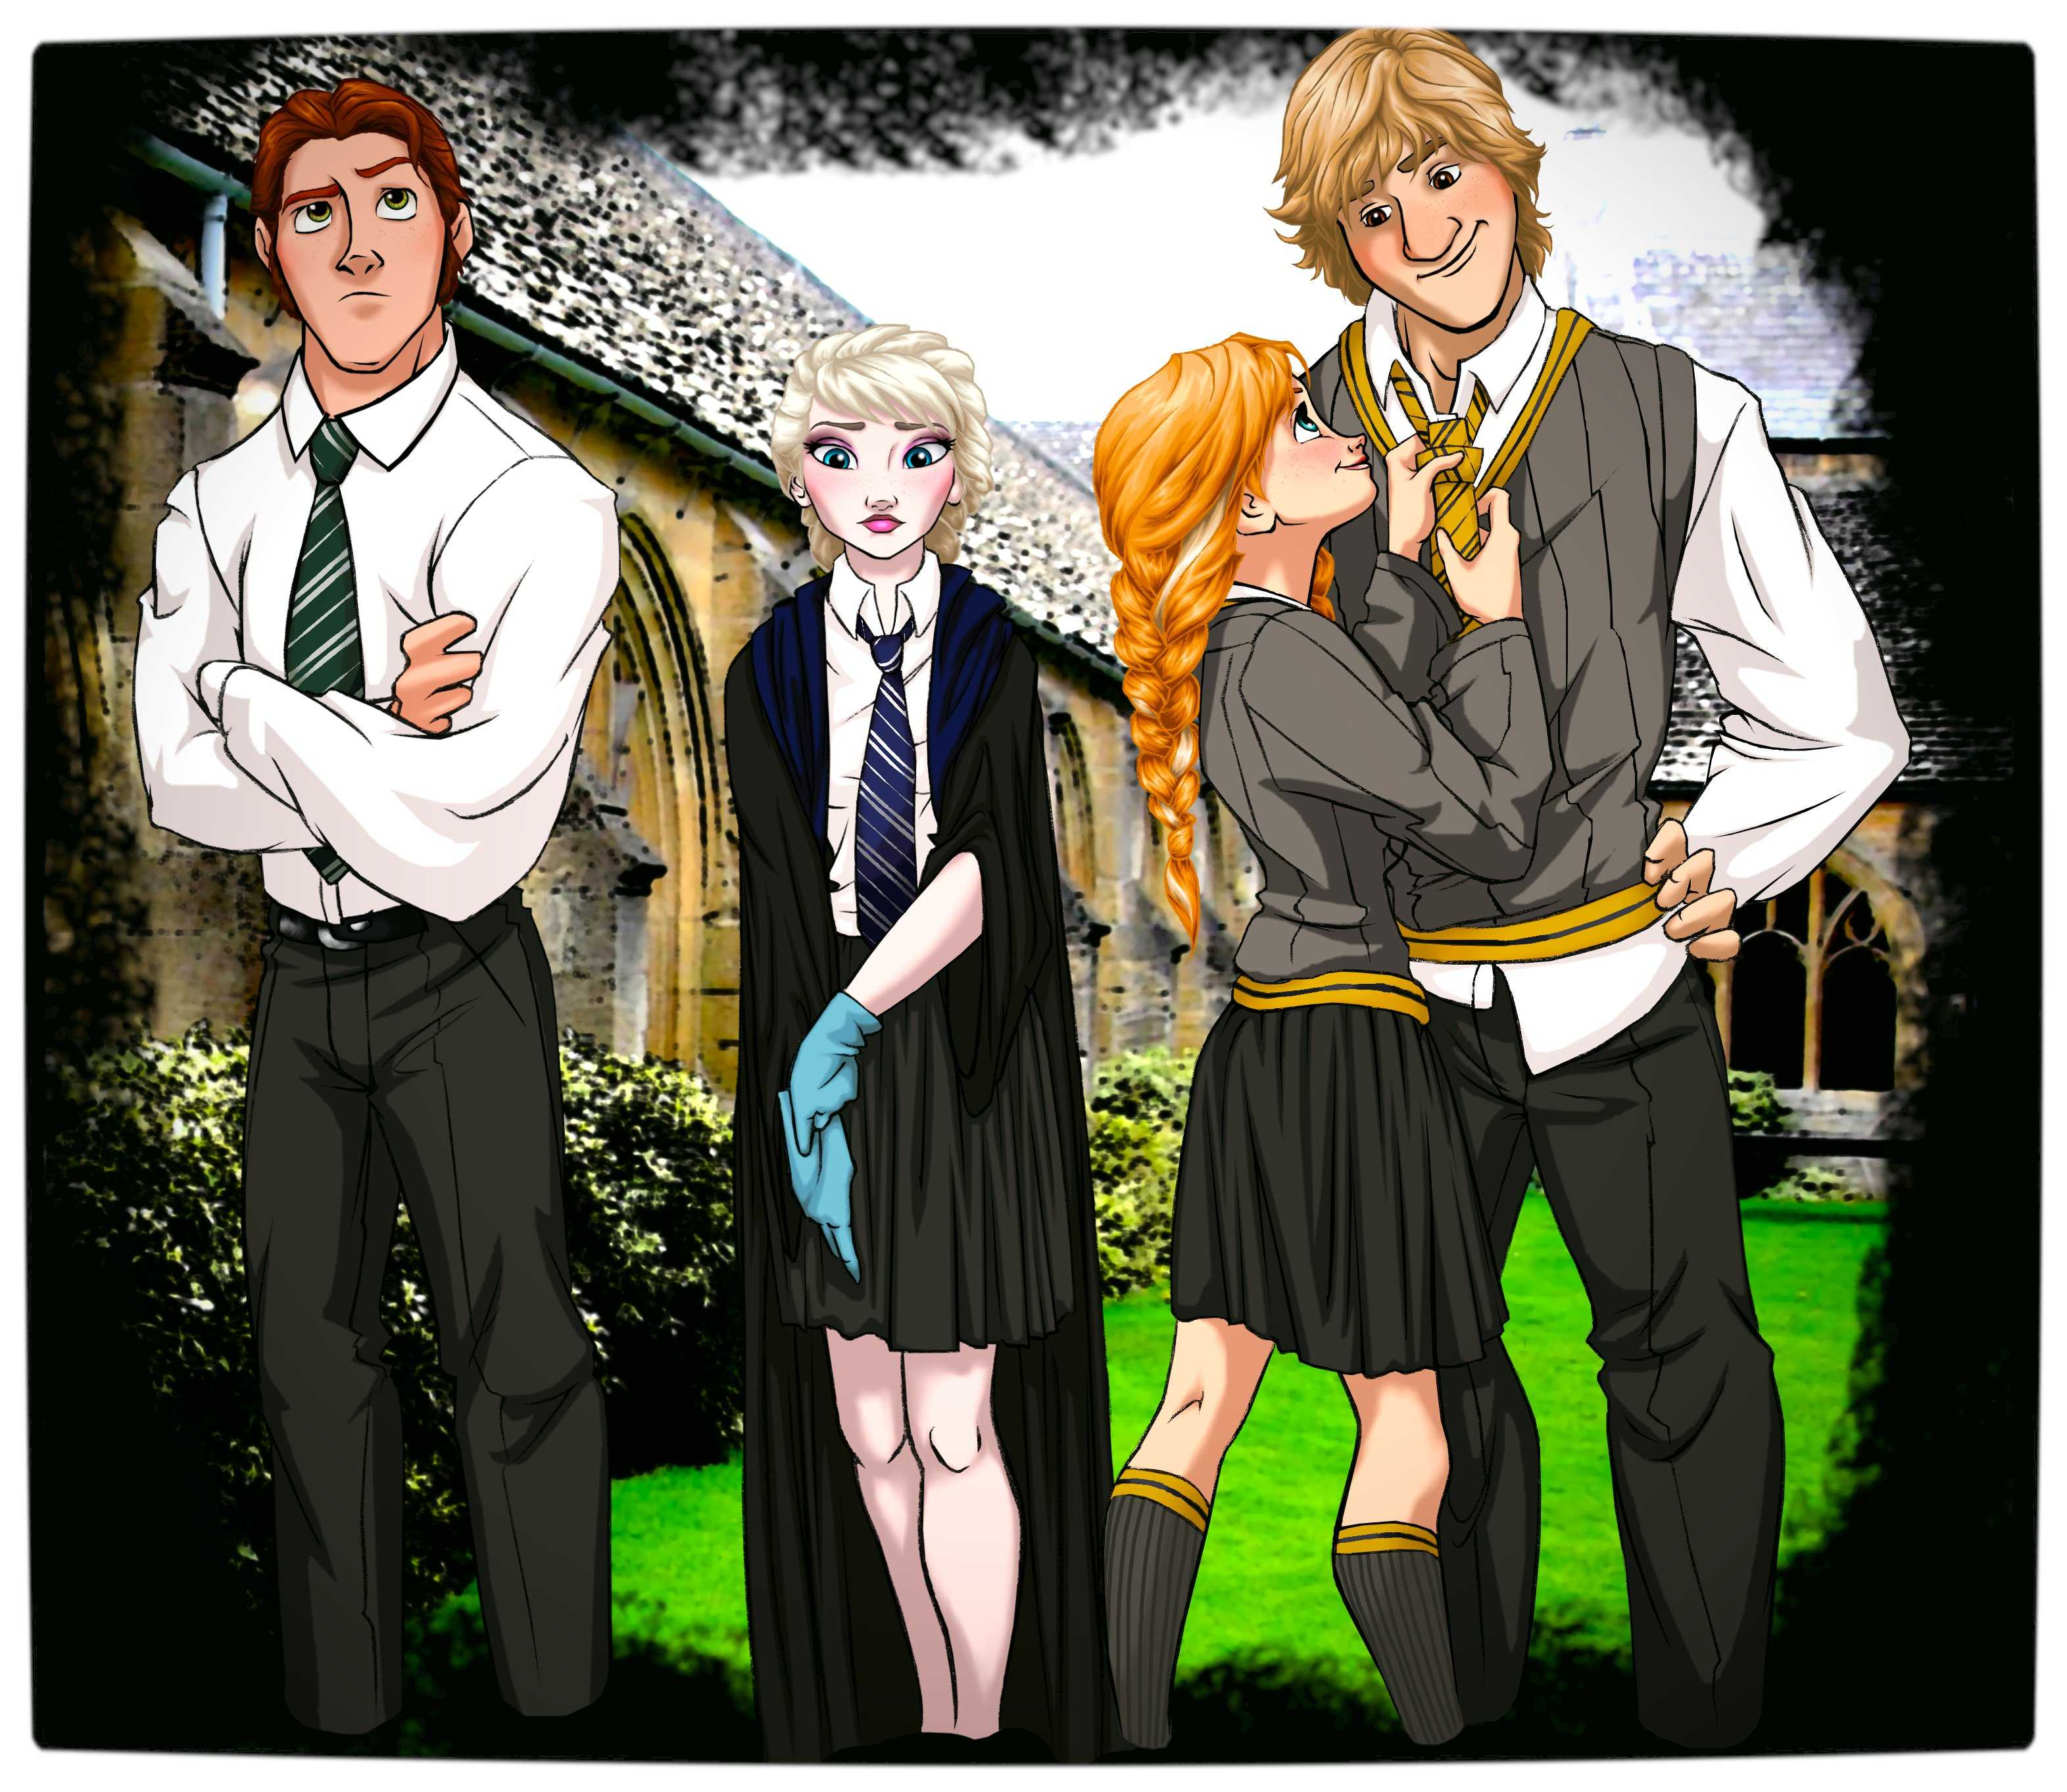 Anime Characters Hogwarts Houses : Hufflepuff characters pixshark images